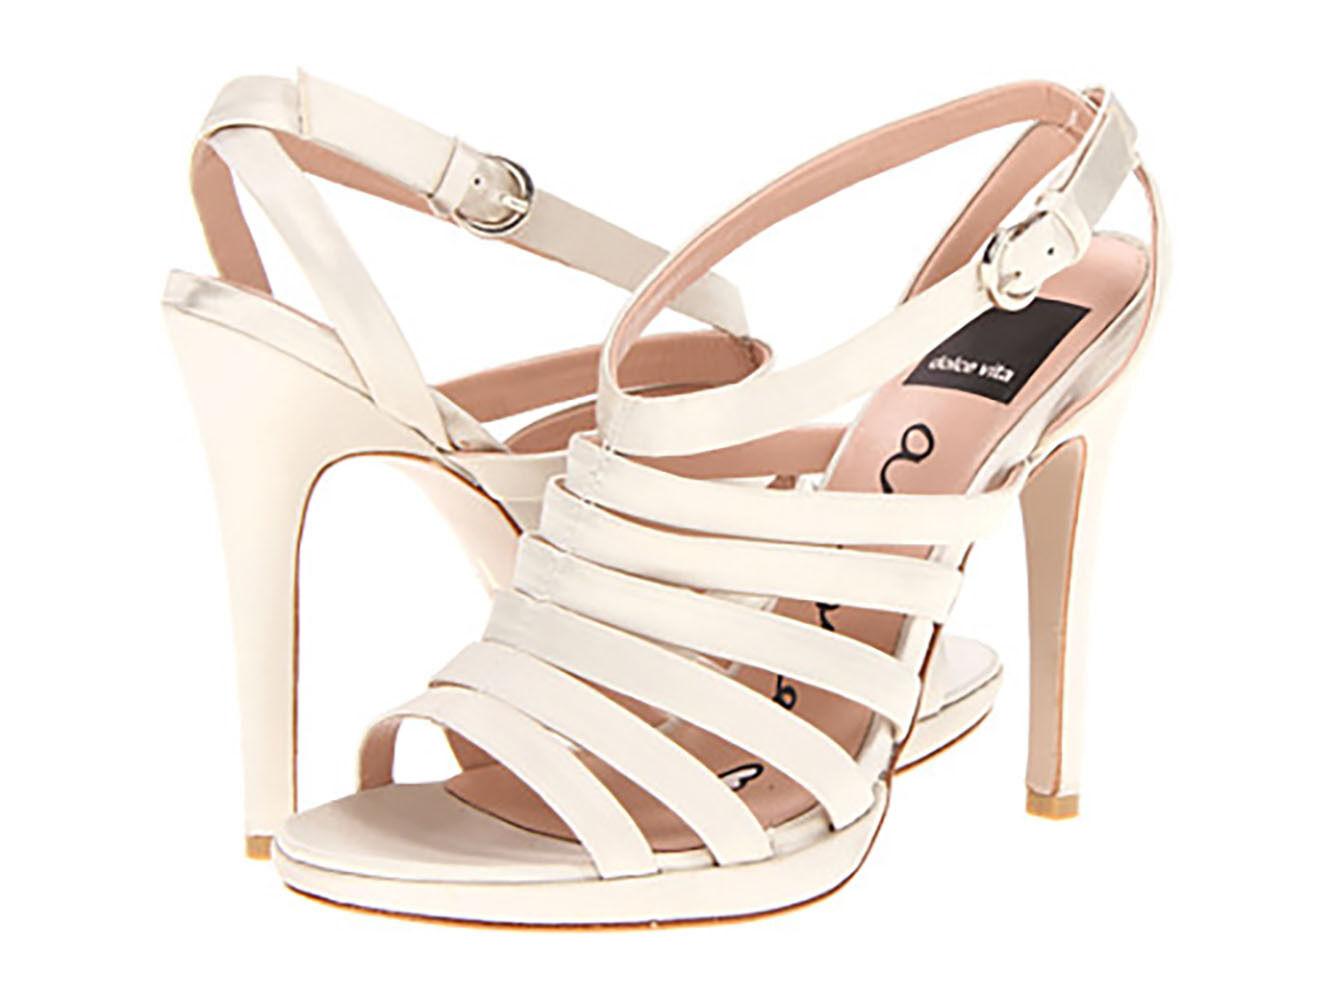 Dolce Vita Size 8 M Elegant Riso Ivory Satin Platform high heels  199, New